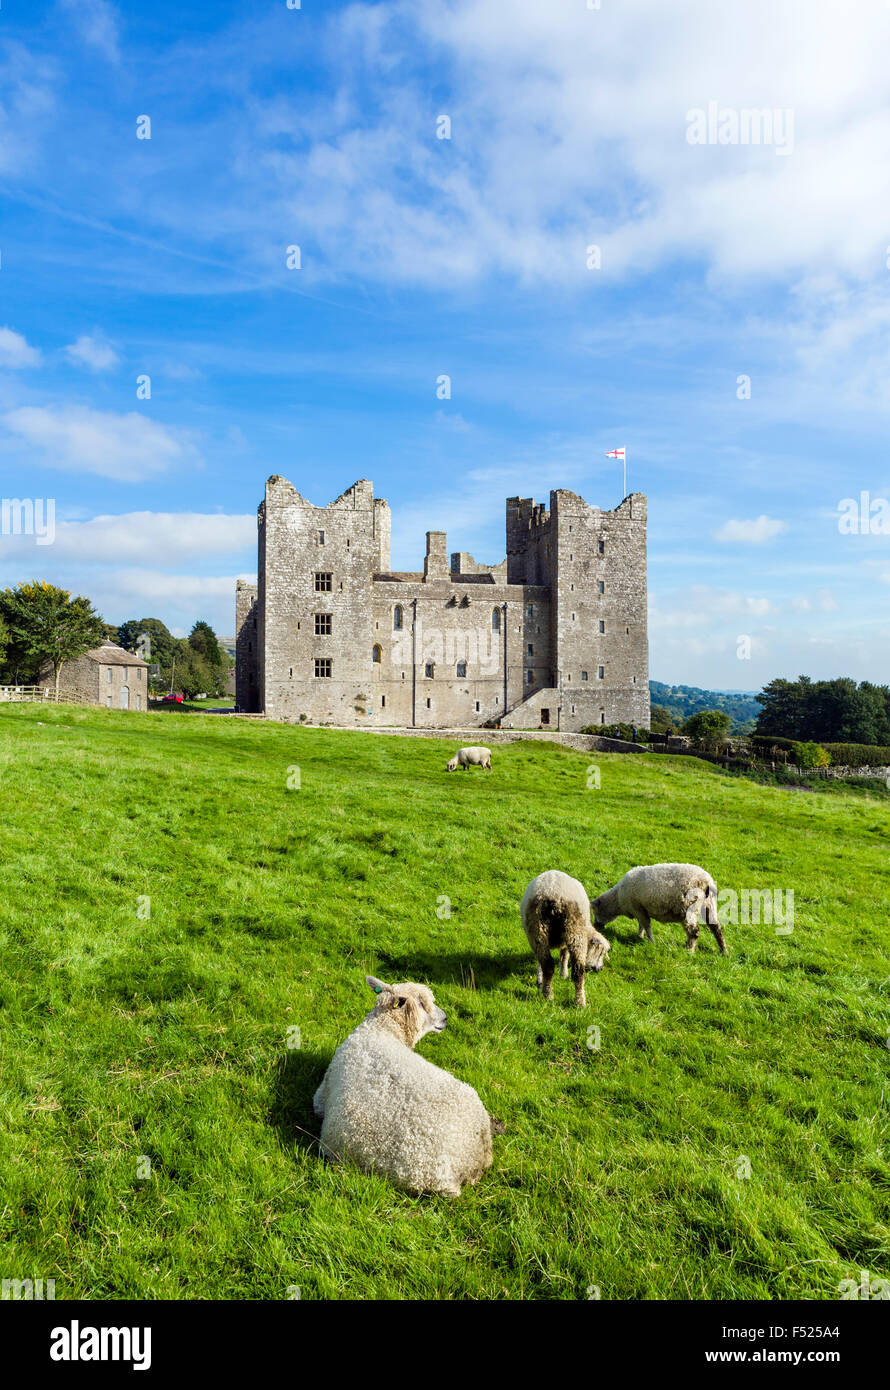 Bolton Castle, Castle Bolton, Wensleydale, Yorkshire Dales, North Yorkshire, England, UK - Stock Image